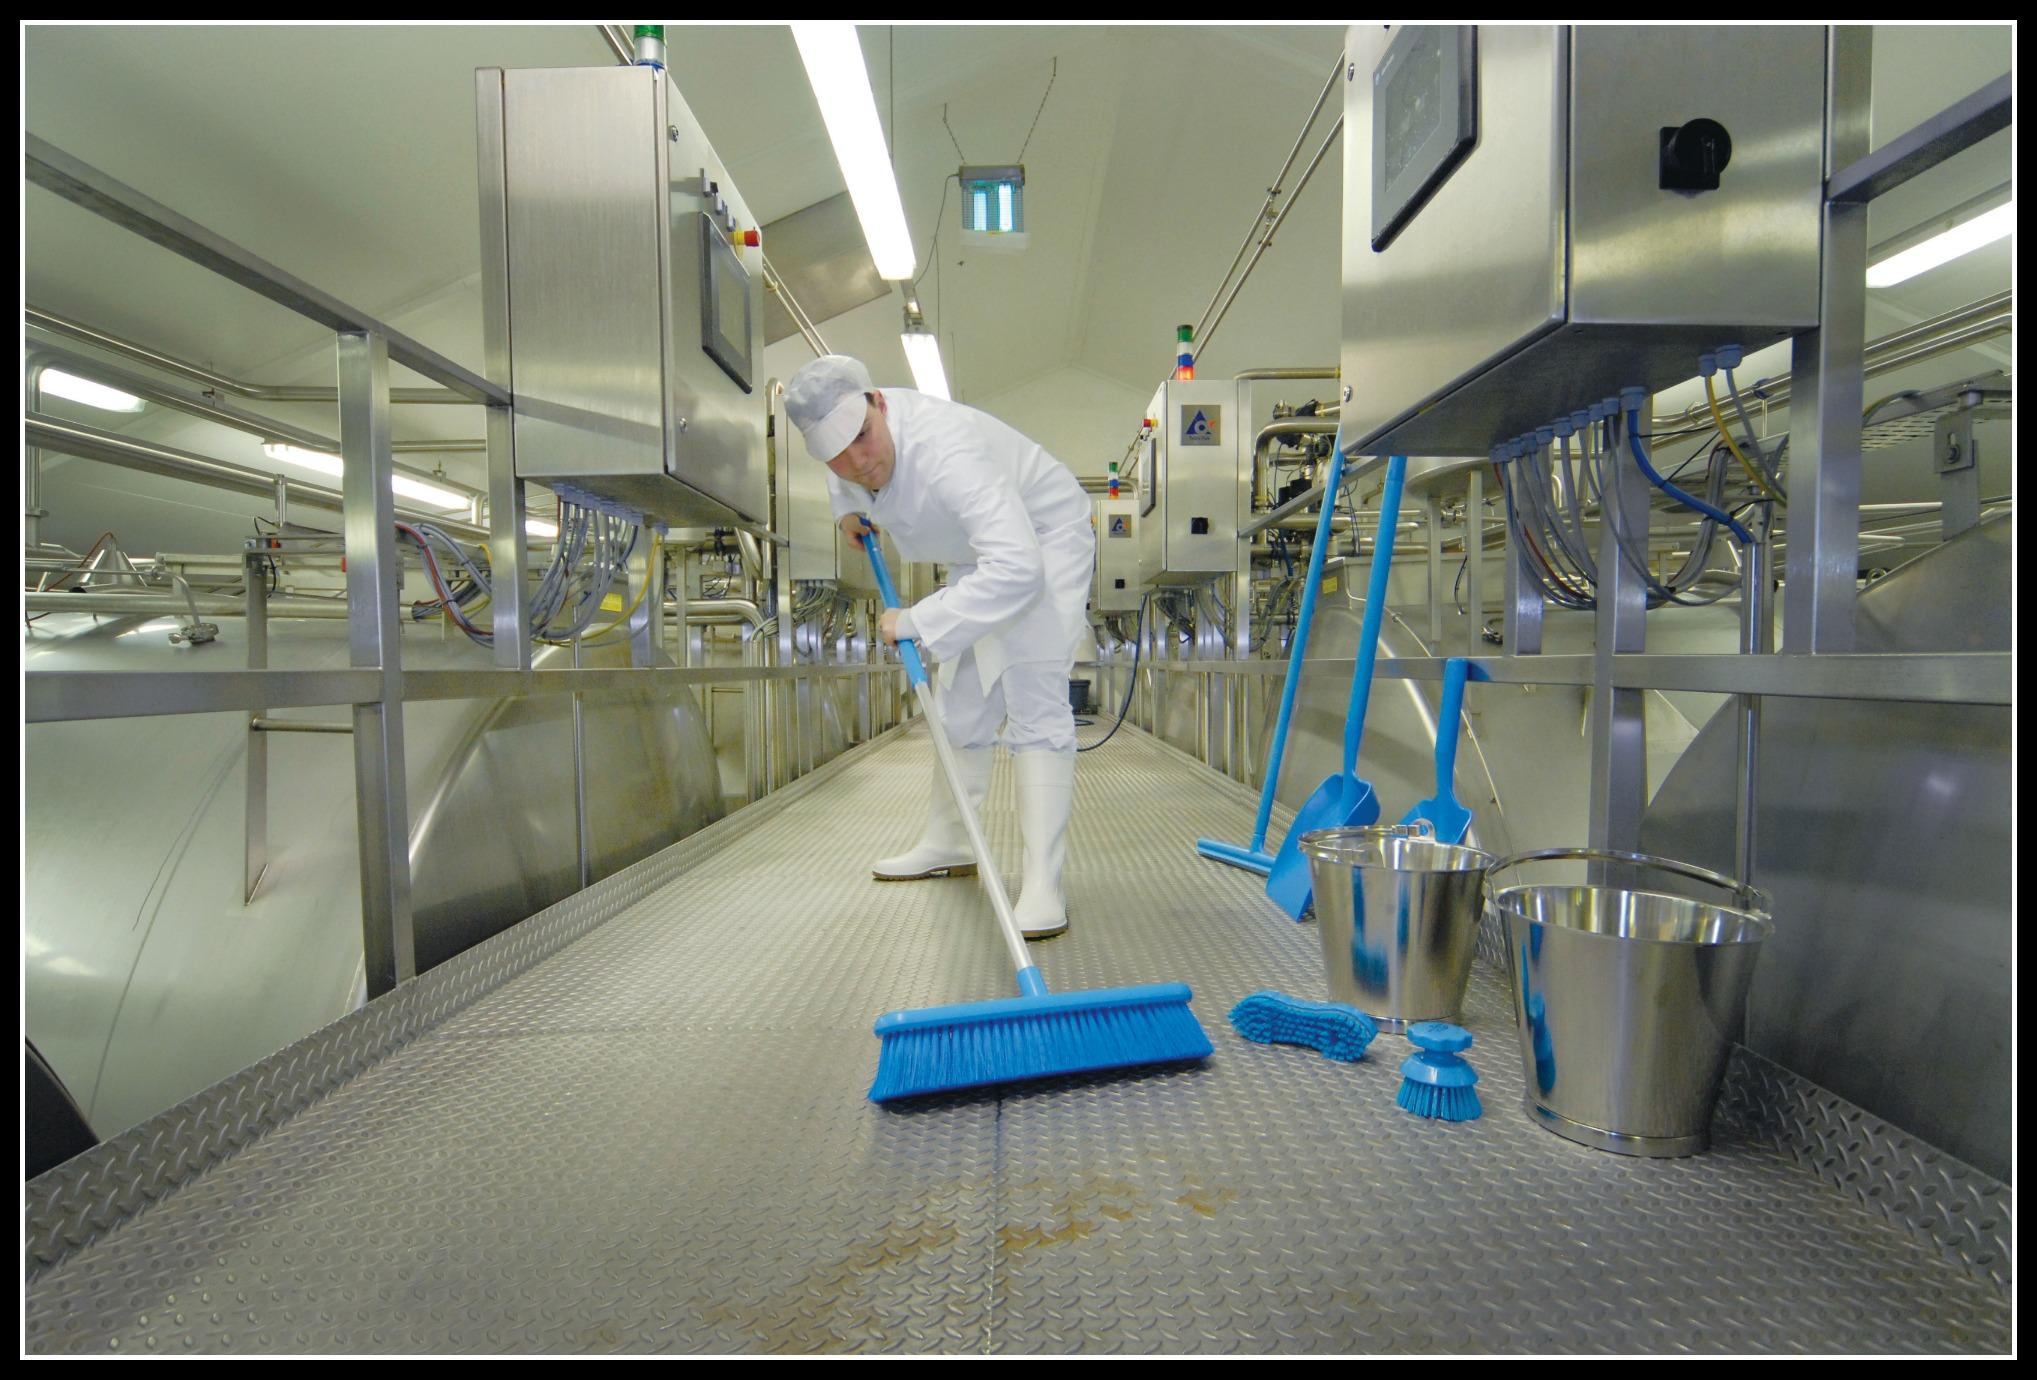 Blue hygiene equipment